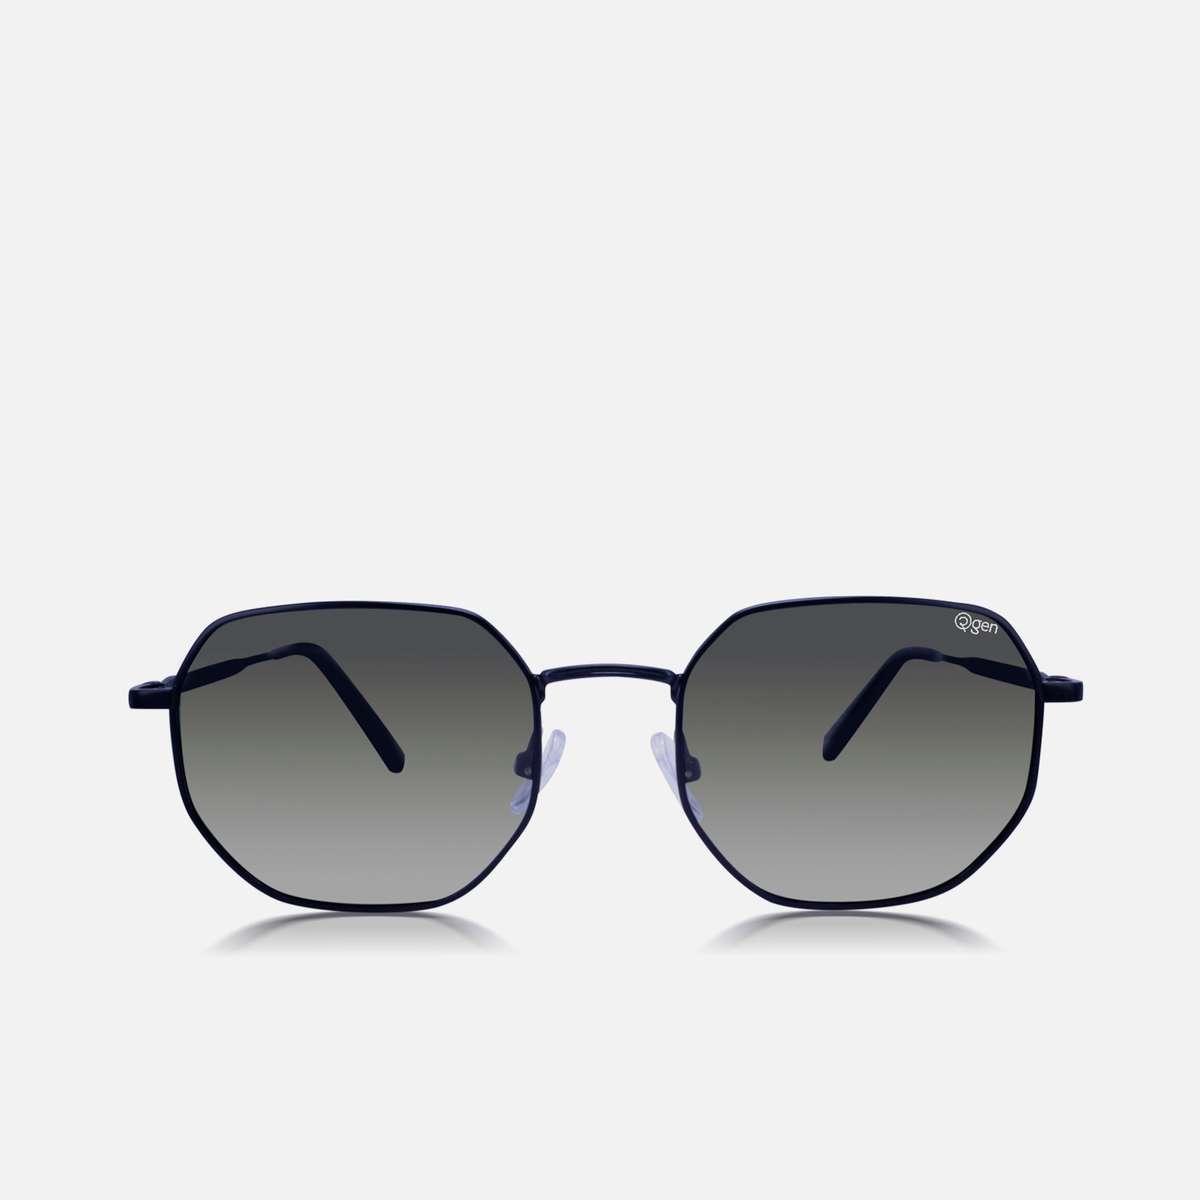 2.O2GEN Men Solid Polarized Geometric Sunglasses- O2-21-007-C3-P